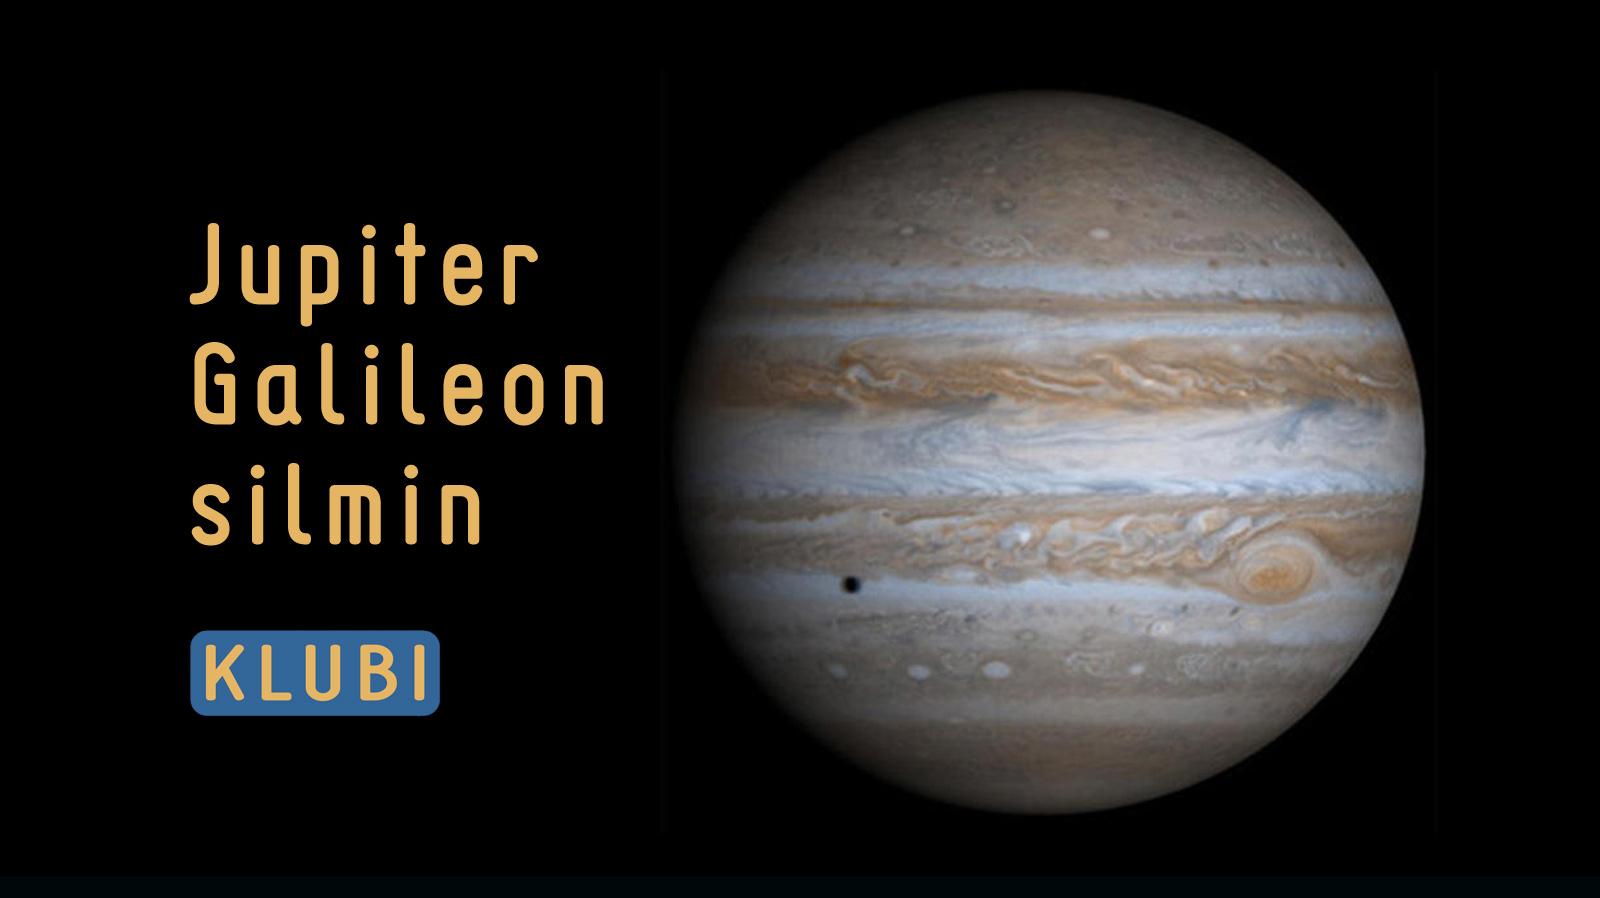 Jupiter Galileon silmin